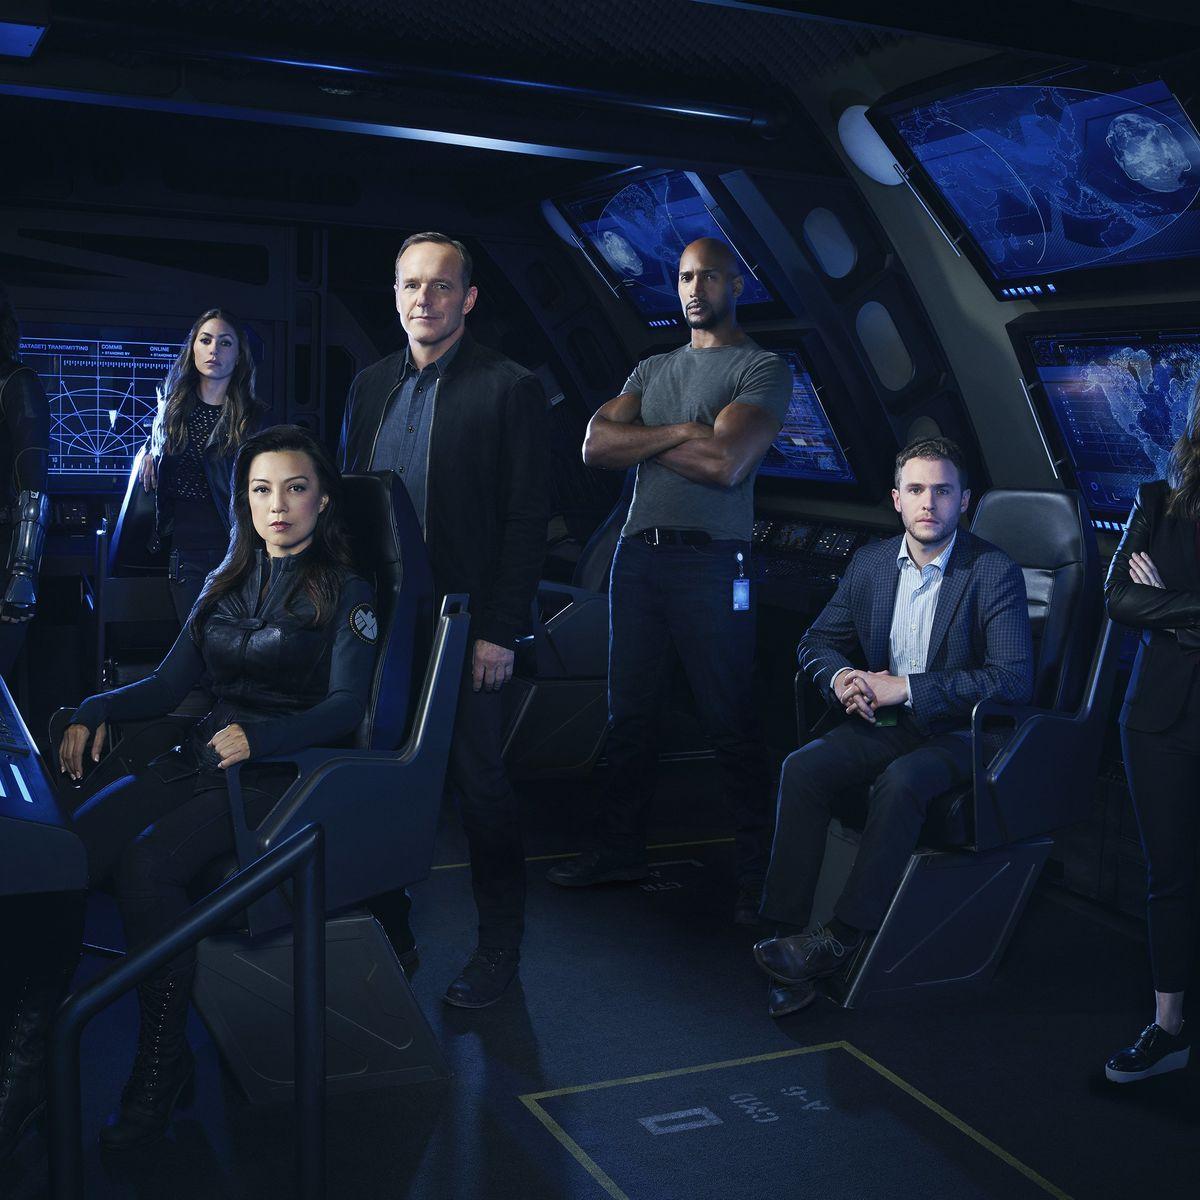 Agents-of-SHIELD-season4-key-art.jpg